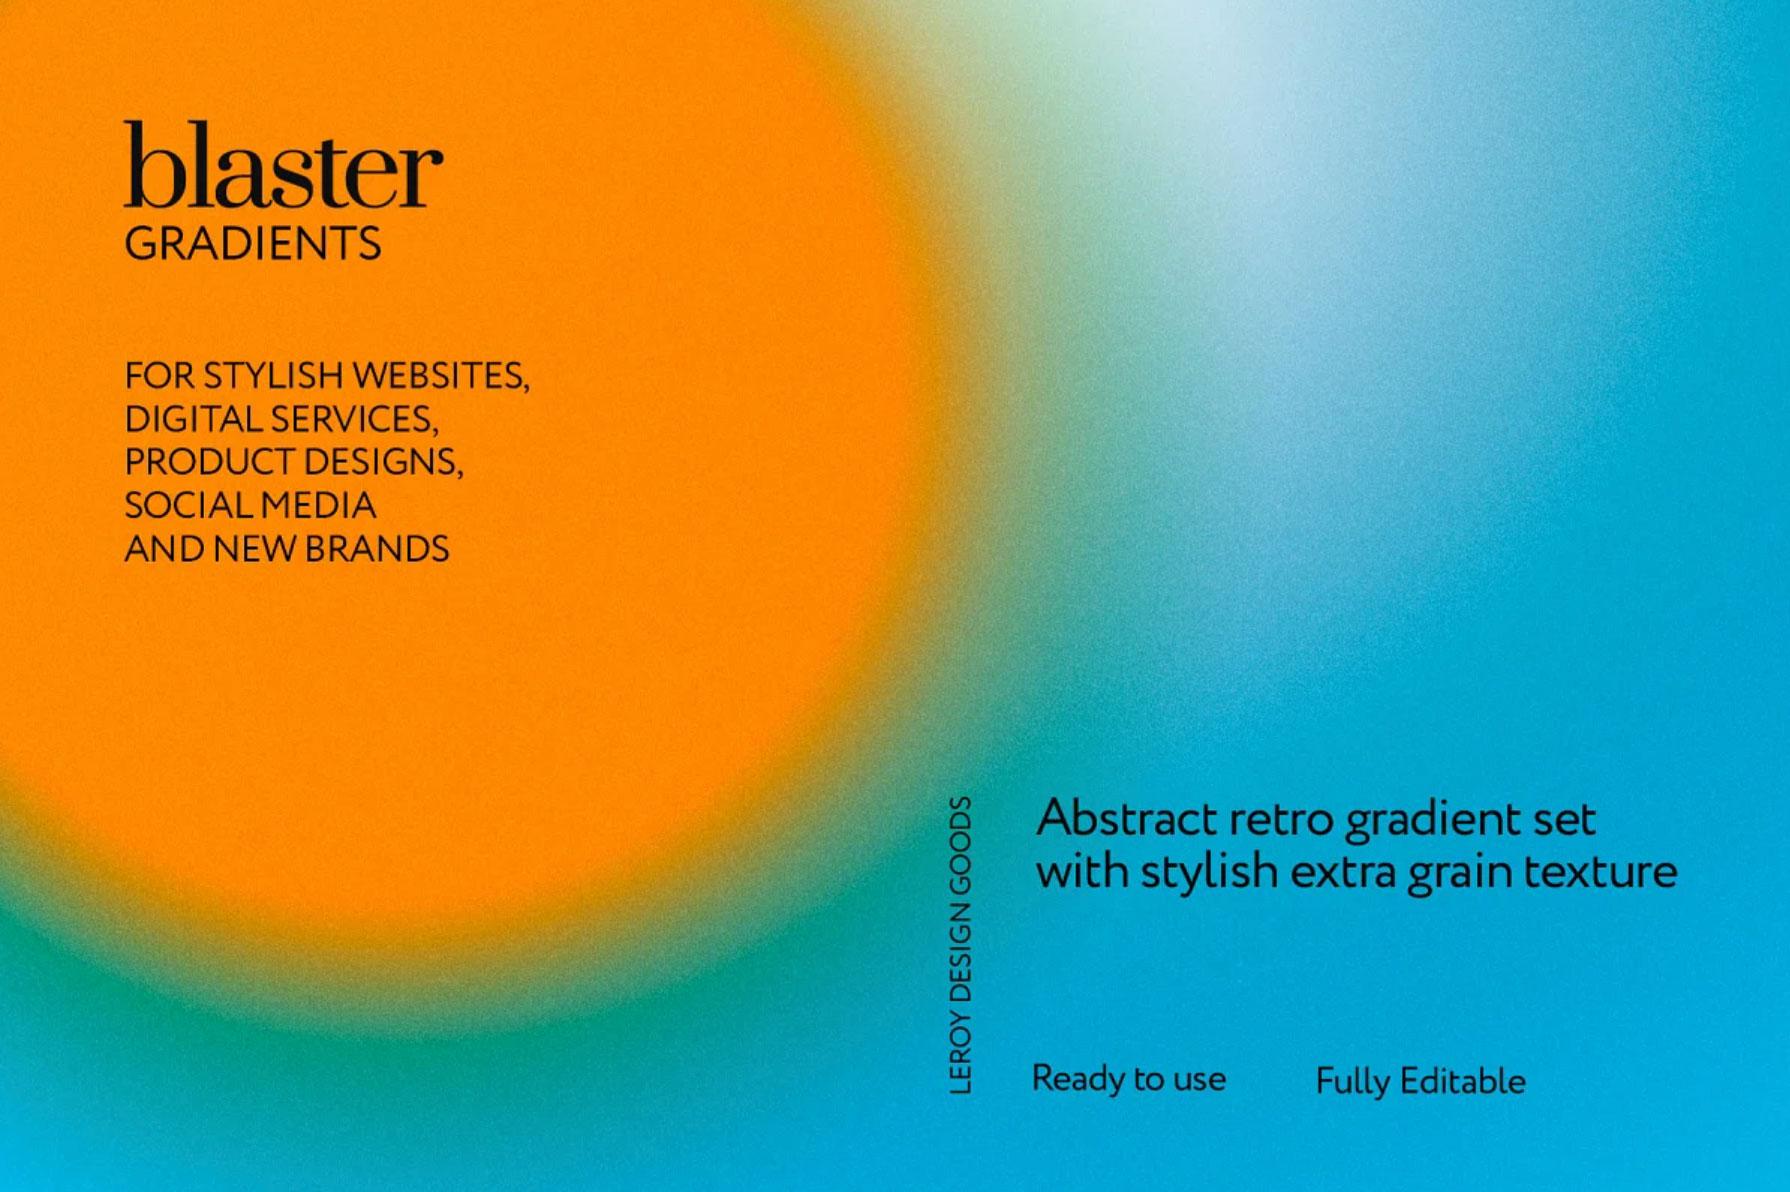 blaster-gradient-2